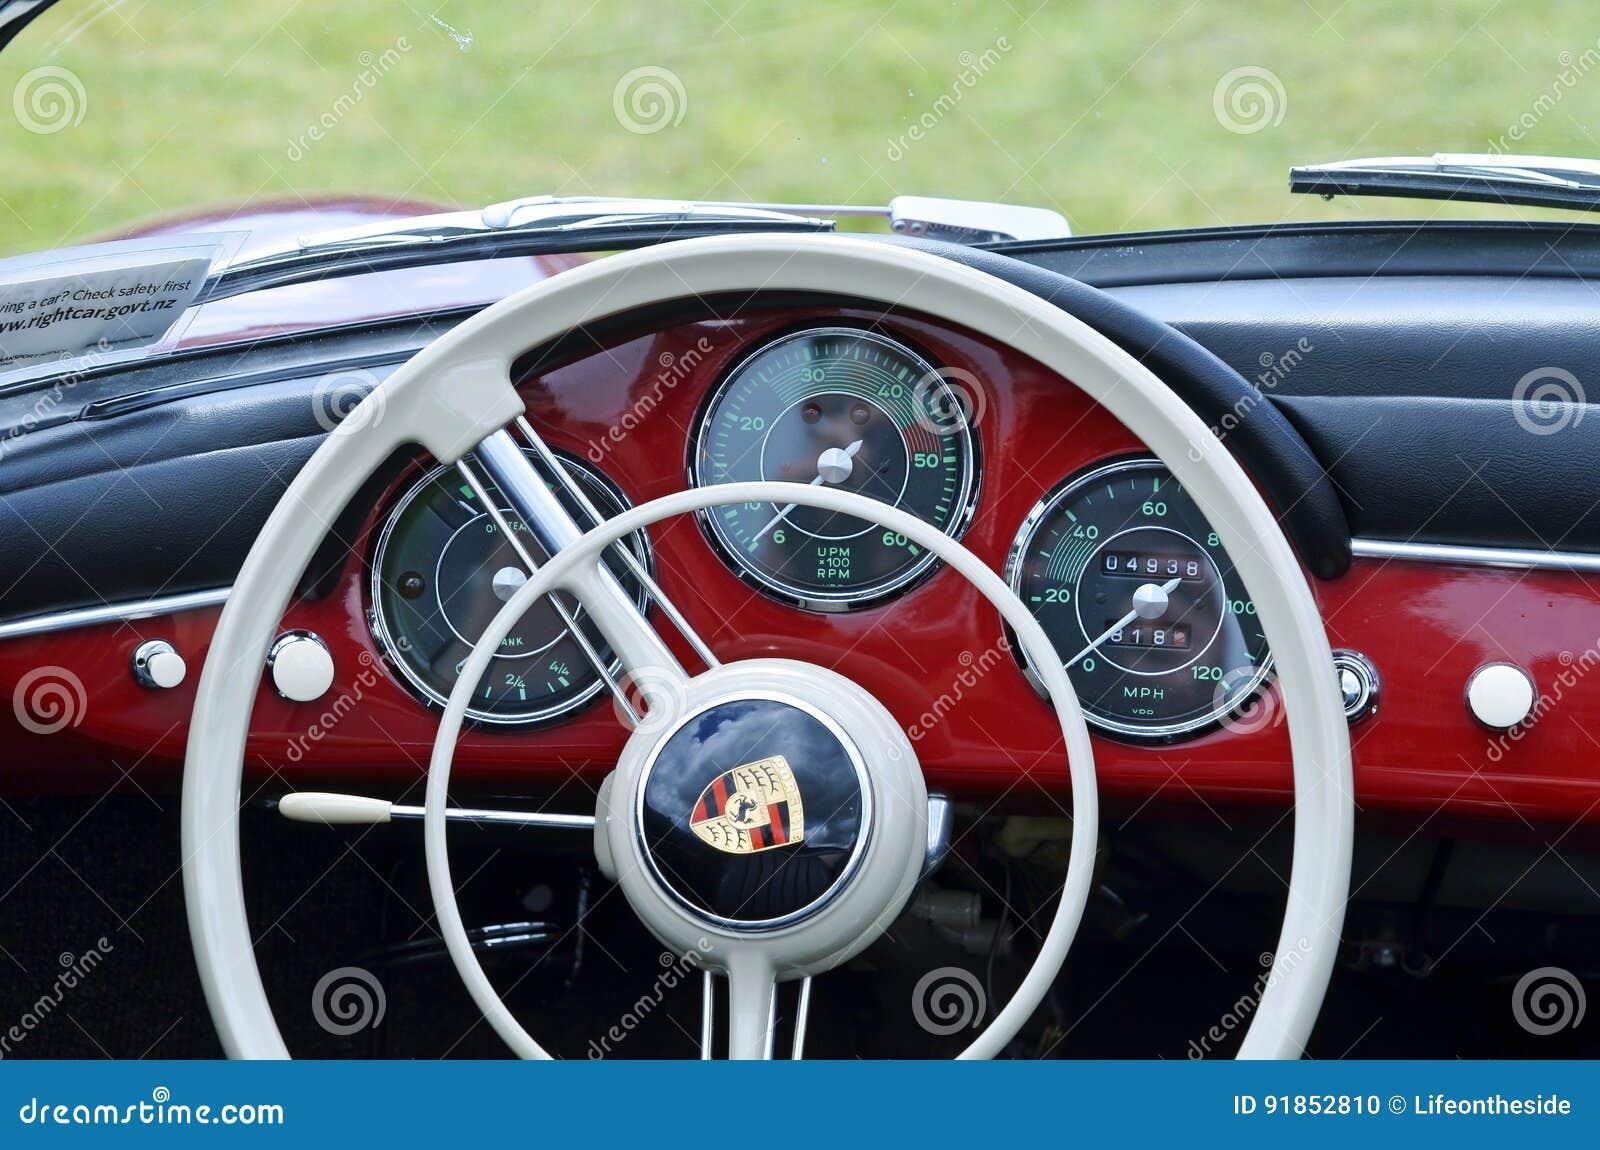 Steering Wheel Amp Dashboard Of Red Vintage Retro 1958